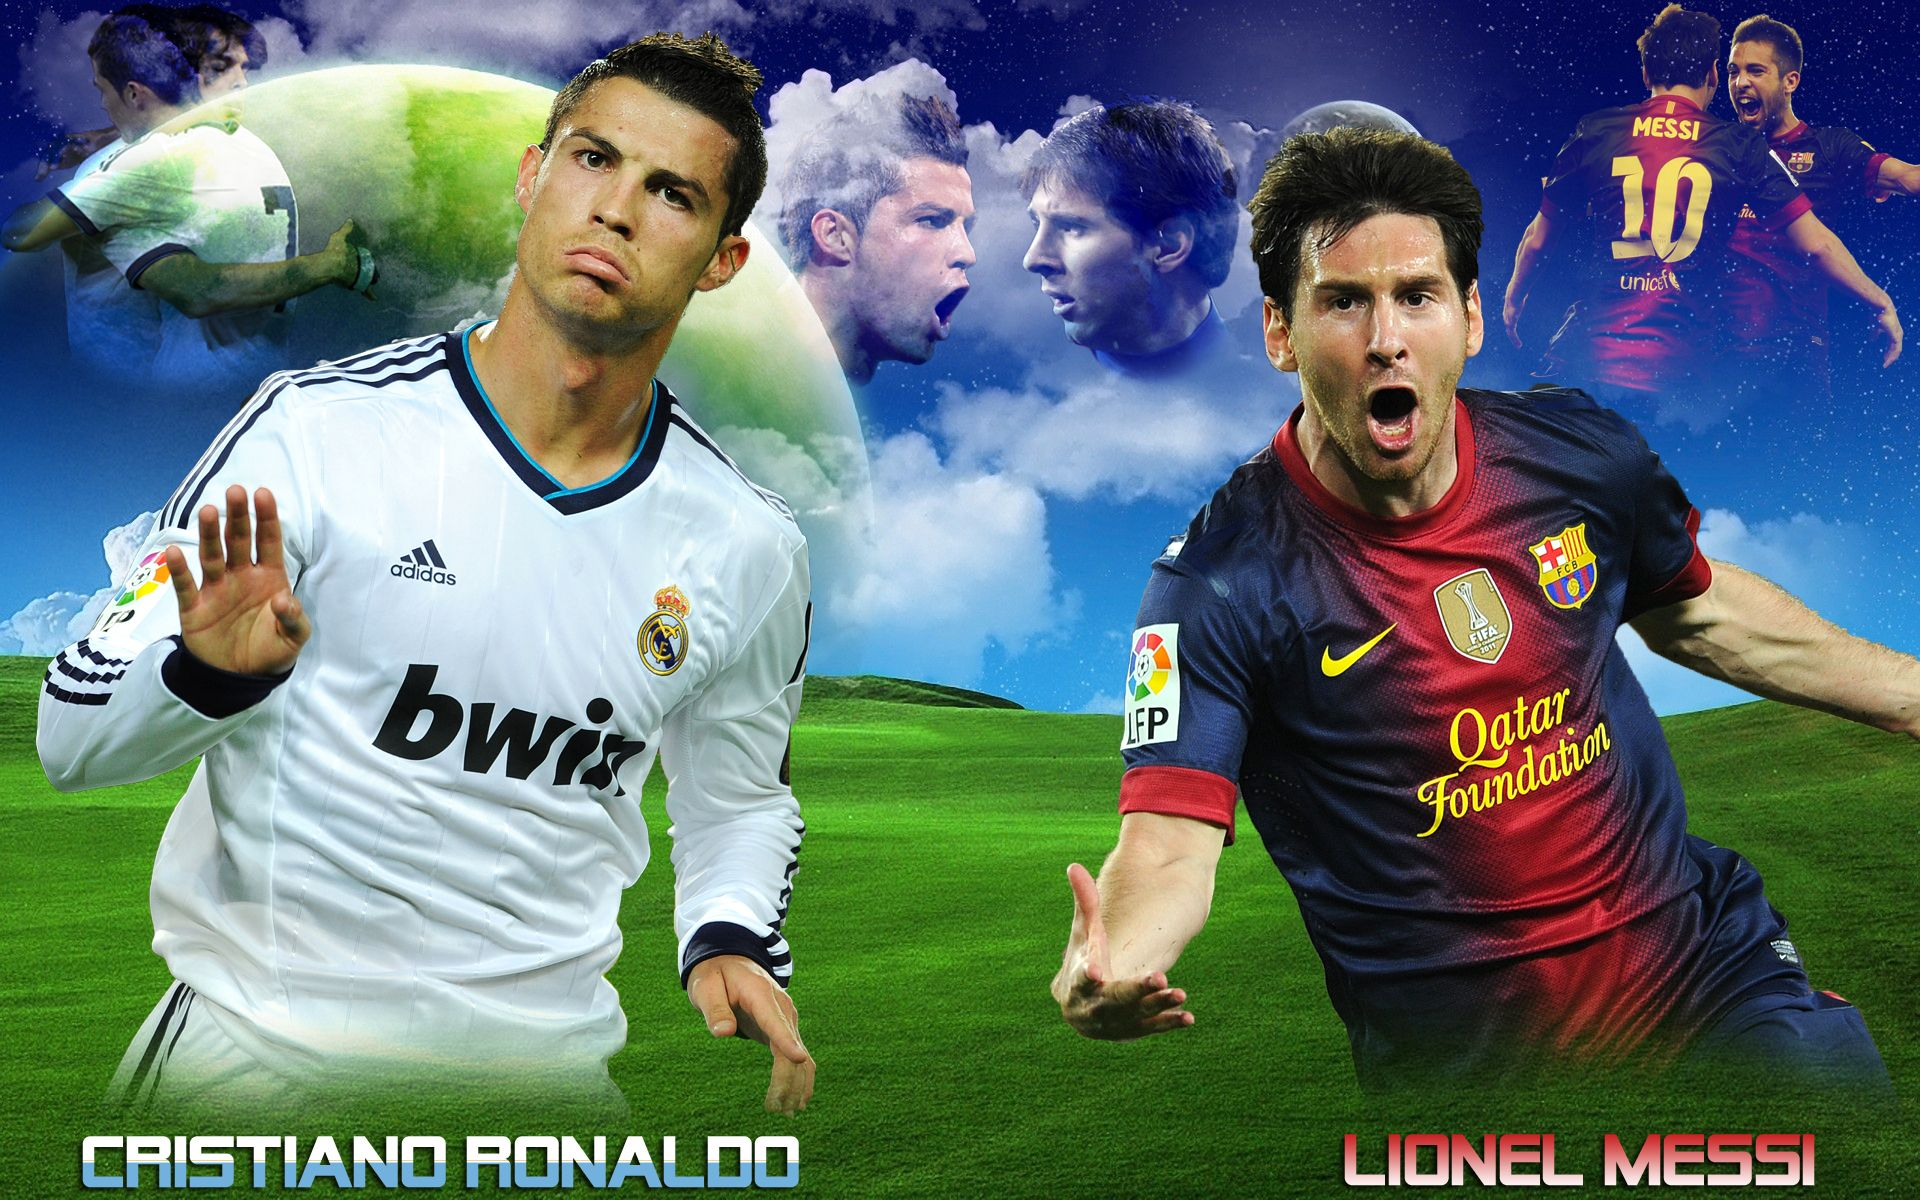 cristiano ronaldo soccer goal vs messi | subho | Pinterest ...